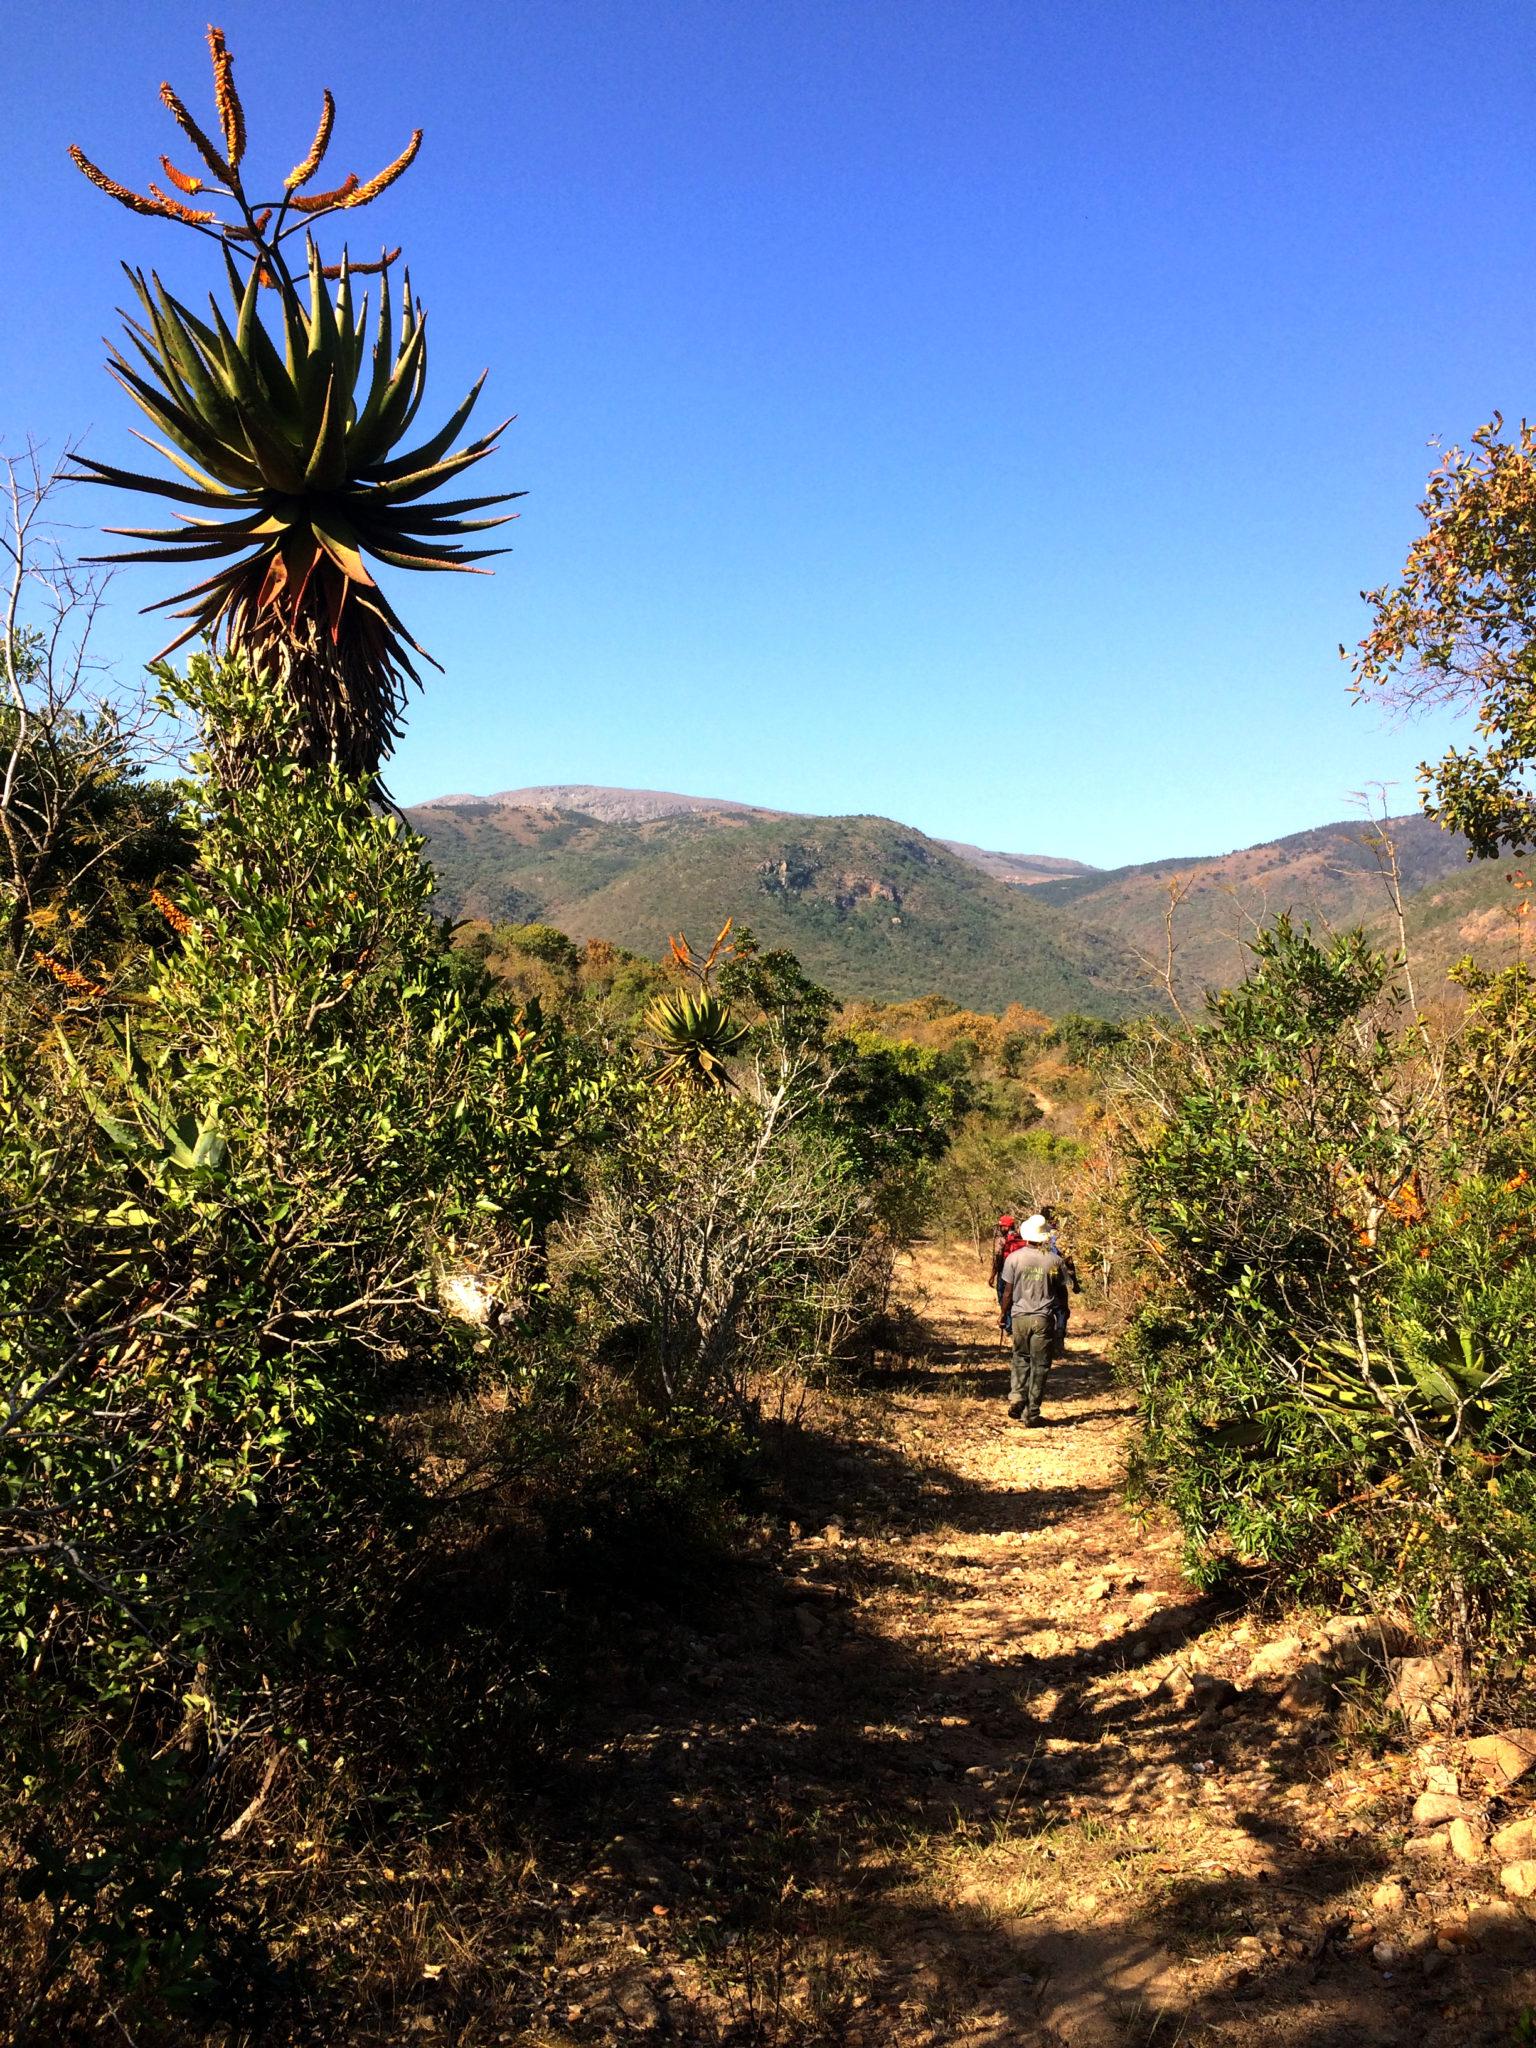 Slackpacking adventure in eSwantini: Ngwempisi Gorge hiking trip